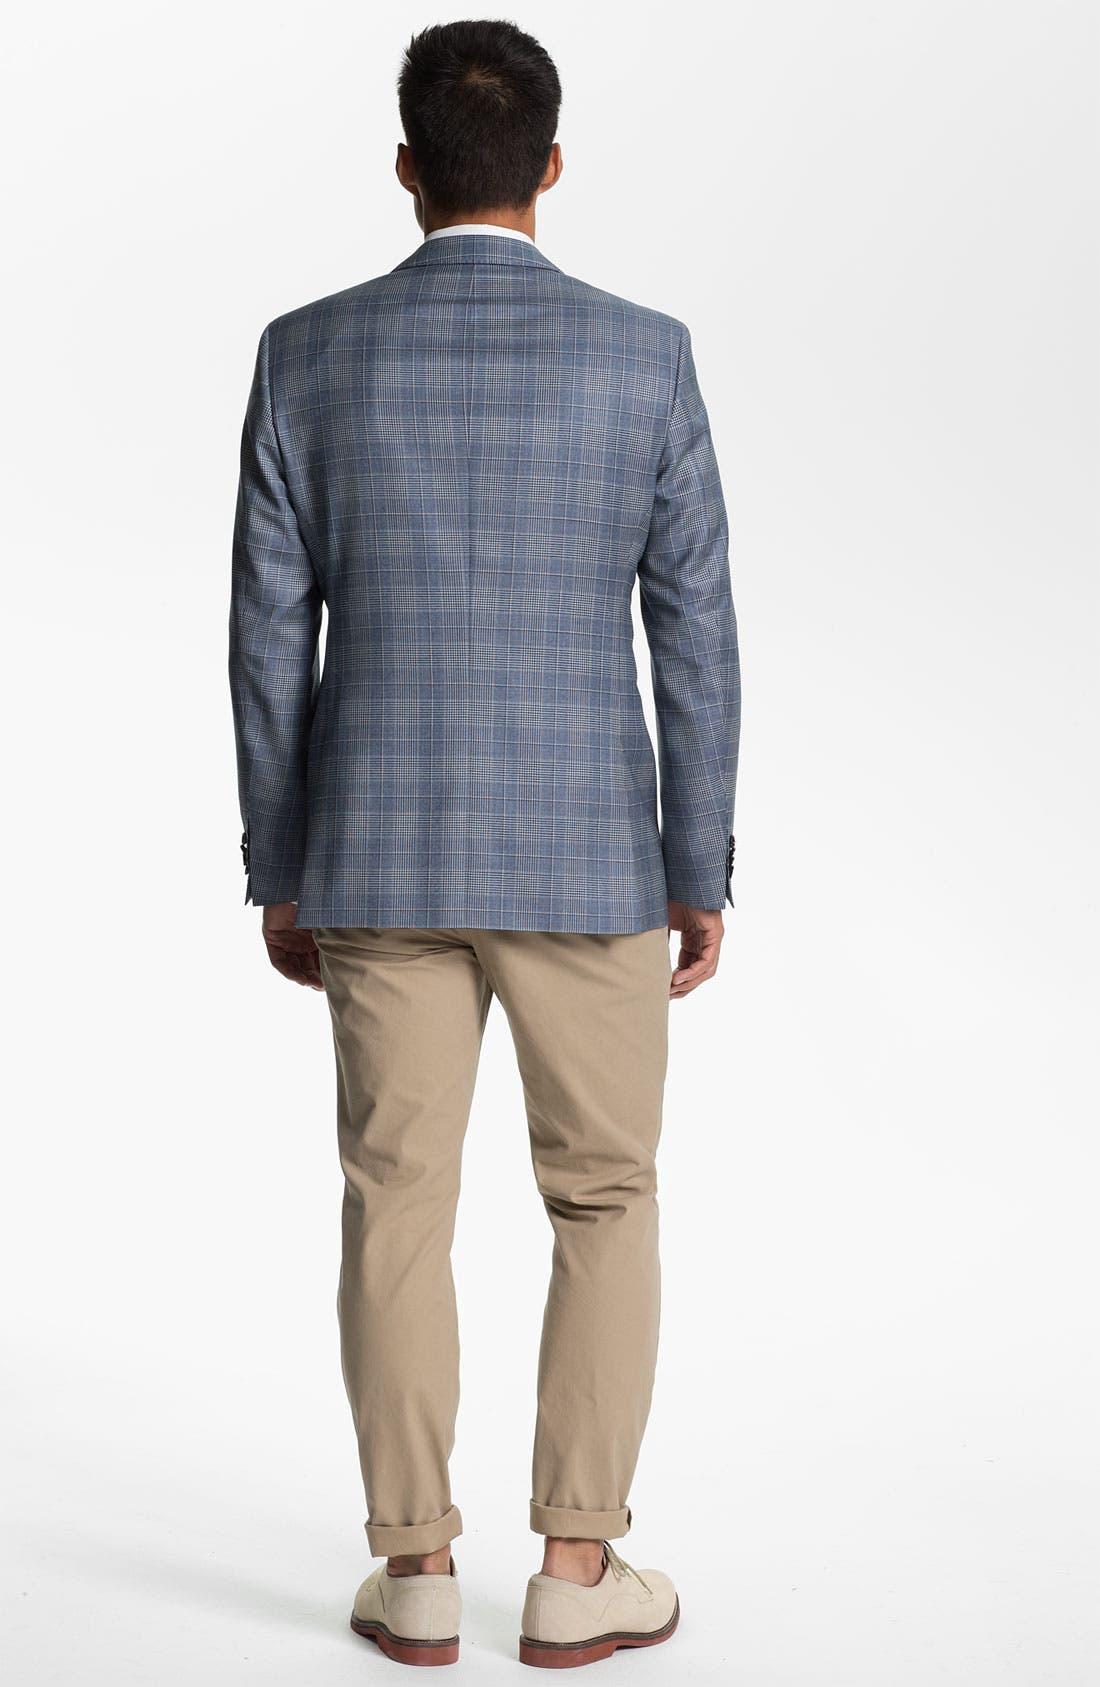 ZZDNUHUGO BOSS, BOSS Black 'James' Trim Fit Plaid Sportcoat, Alternate thumbnail 2, color, 460